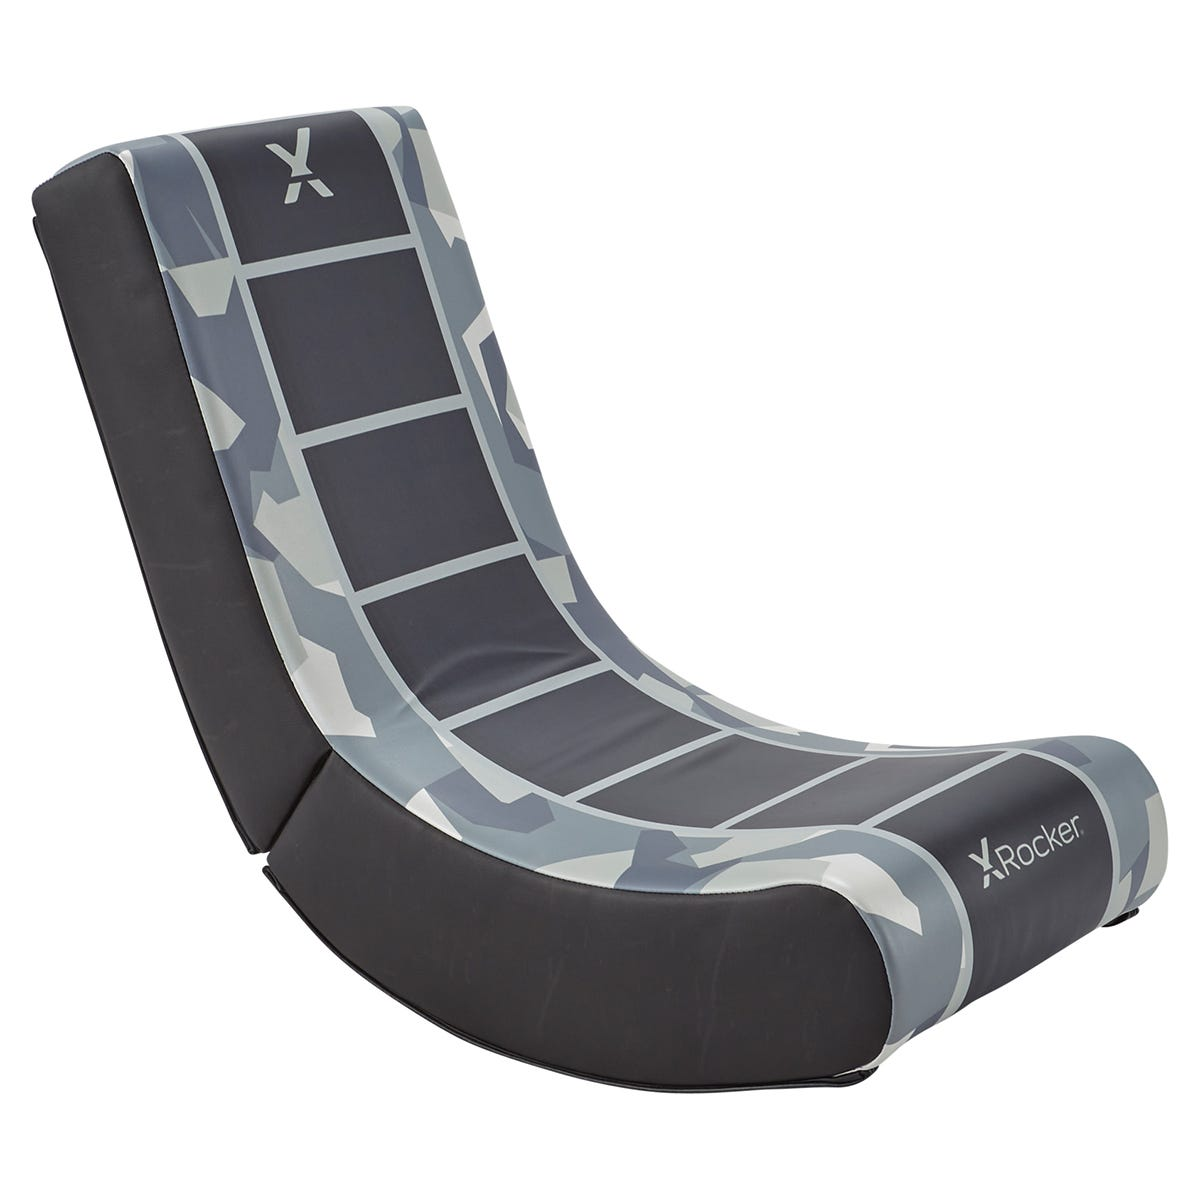 X Rocker X-Rocker Video Rocker Foldable Gaming Chair - Camo Grey